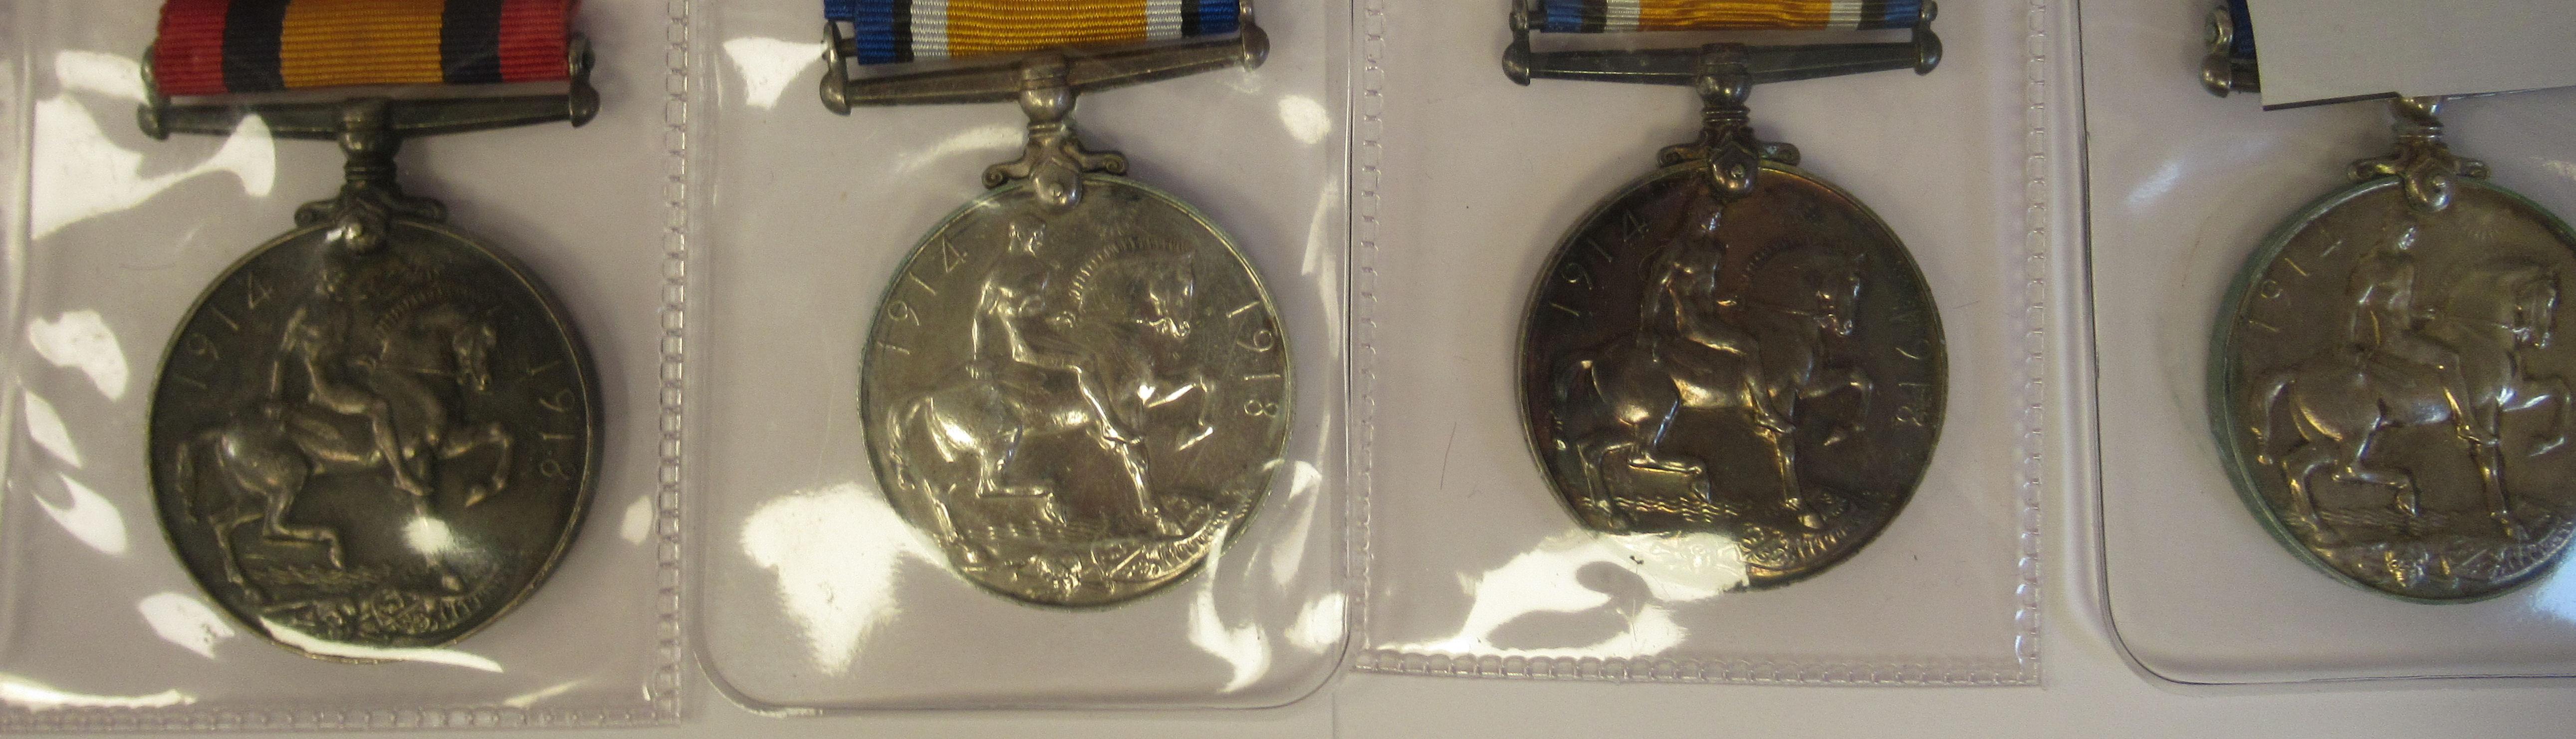 Twenty-four Great War 1914-1918 British service medals on ribbons, viz. 46481, Gnr. E. Williamson - Image 3 of 16